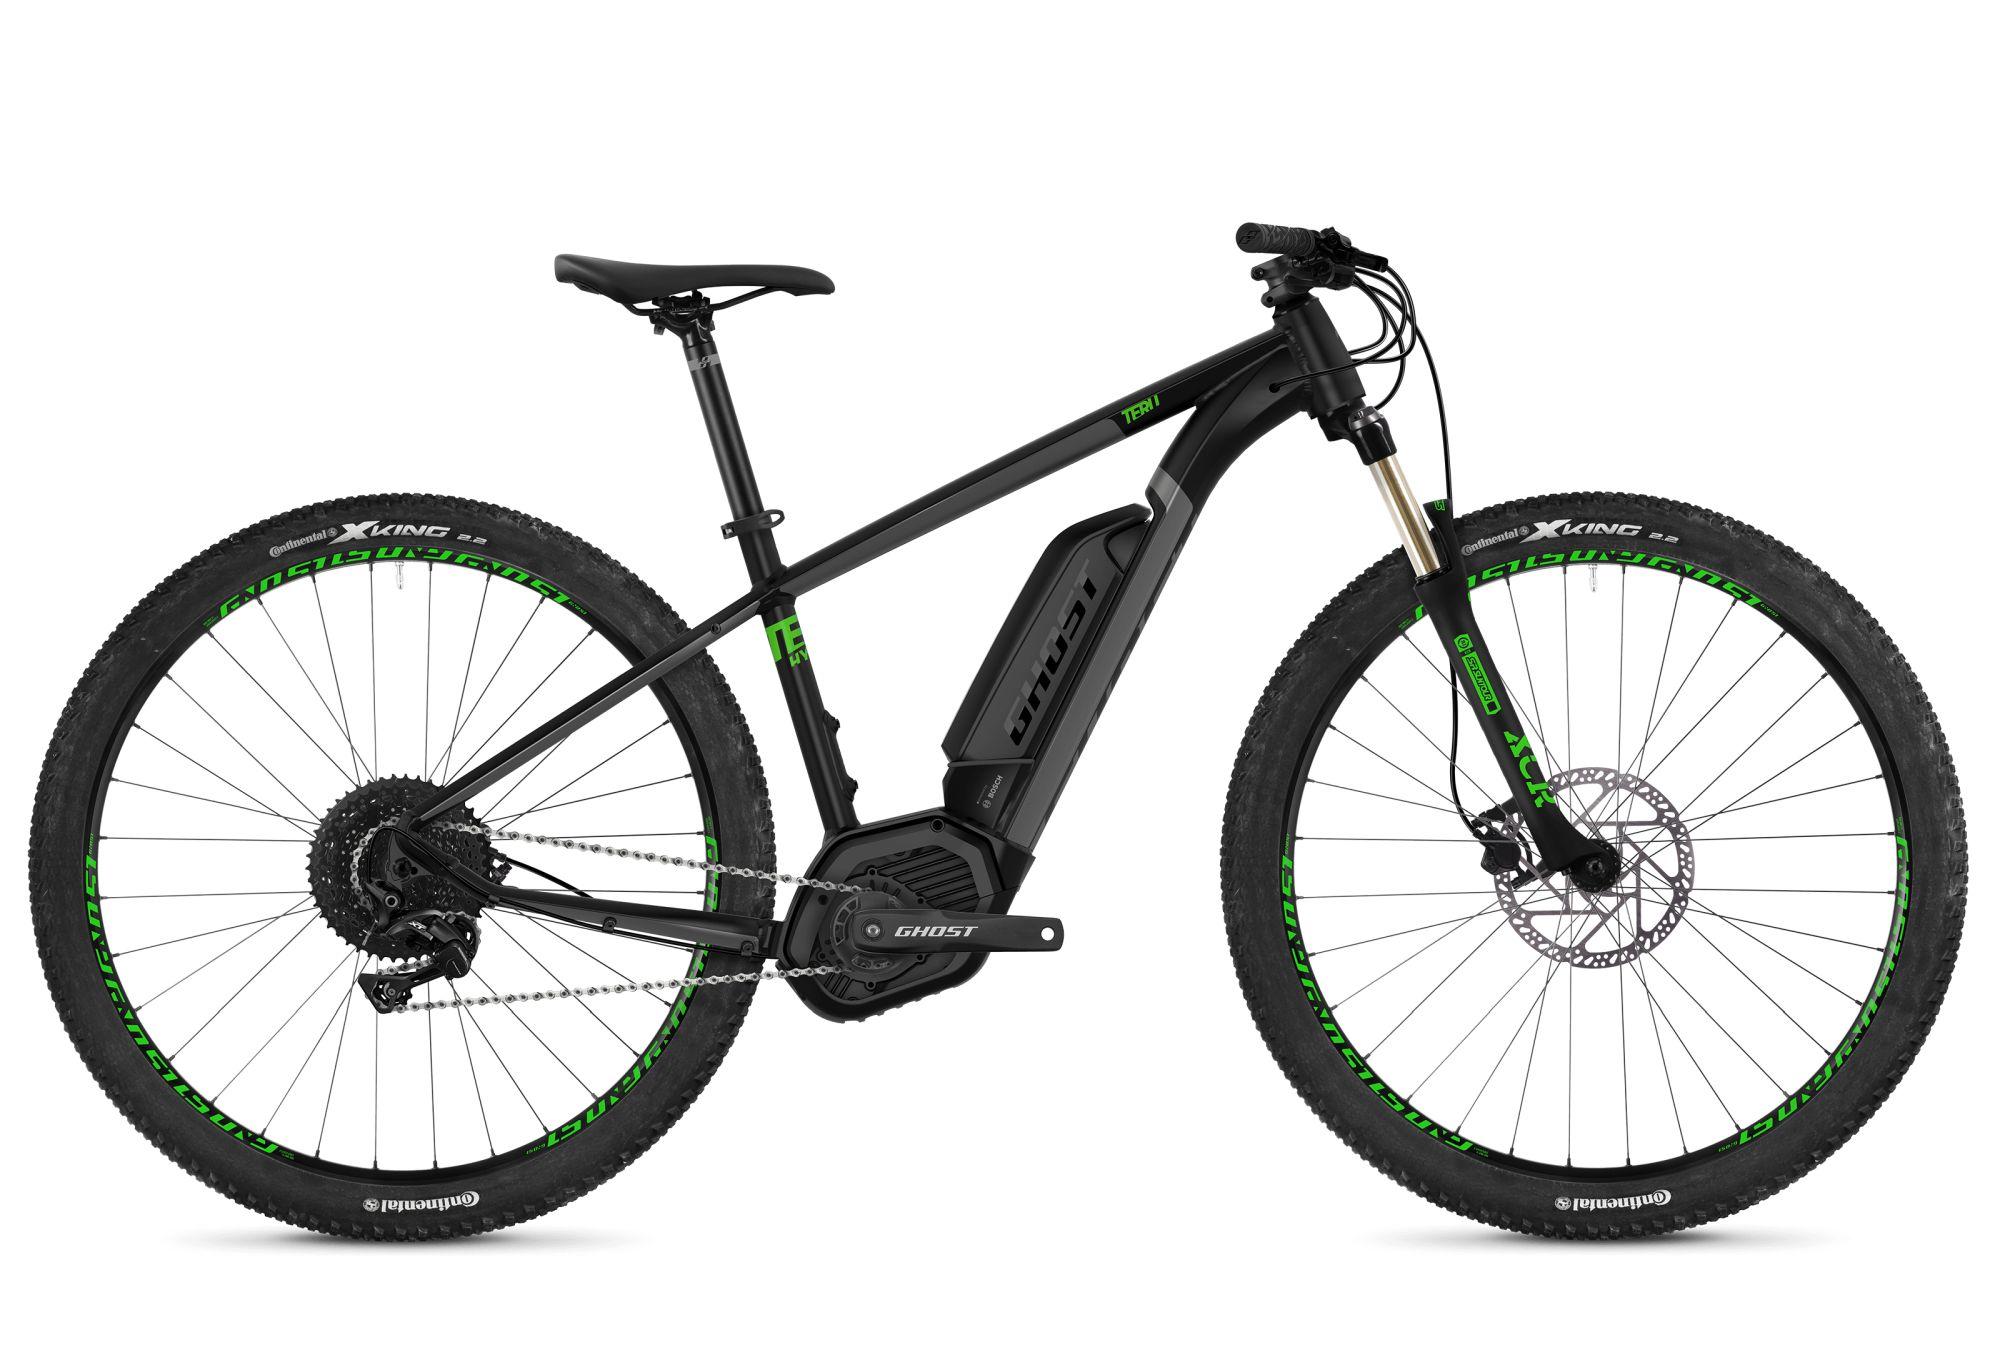 e-Fahrräder/E-Mountainbikes: Diamant GHOST HYB Teru B4.9 AL U 10 Gang Kettenschaltung Herrenfahrrad Diamant Modell 2020 29 Zoll 45.5 cm